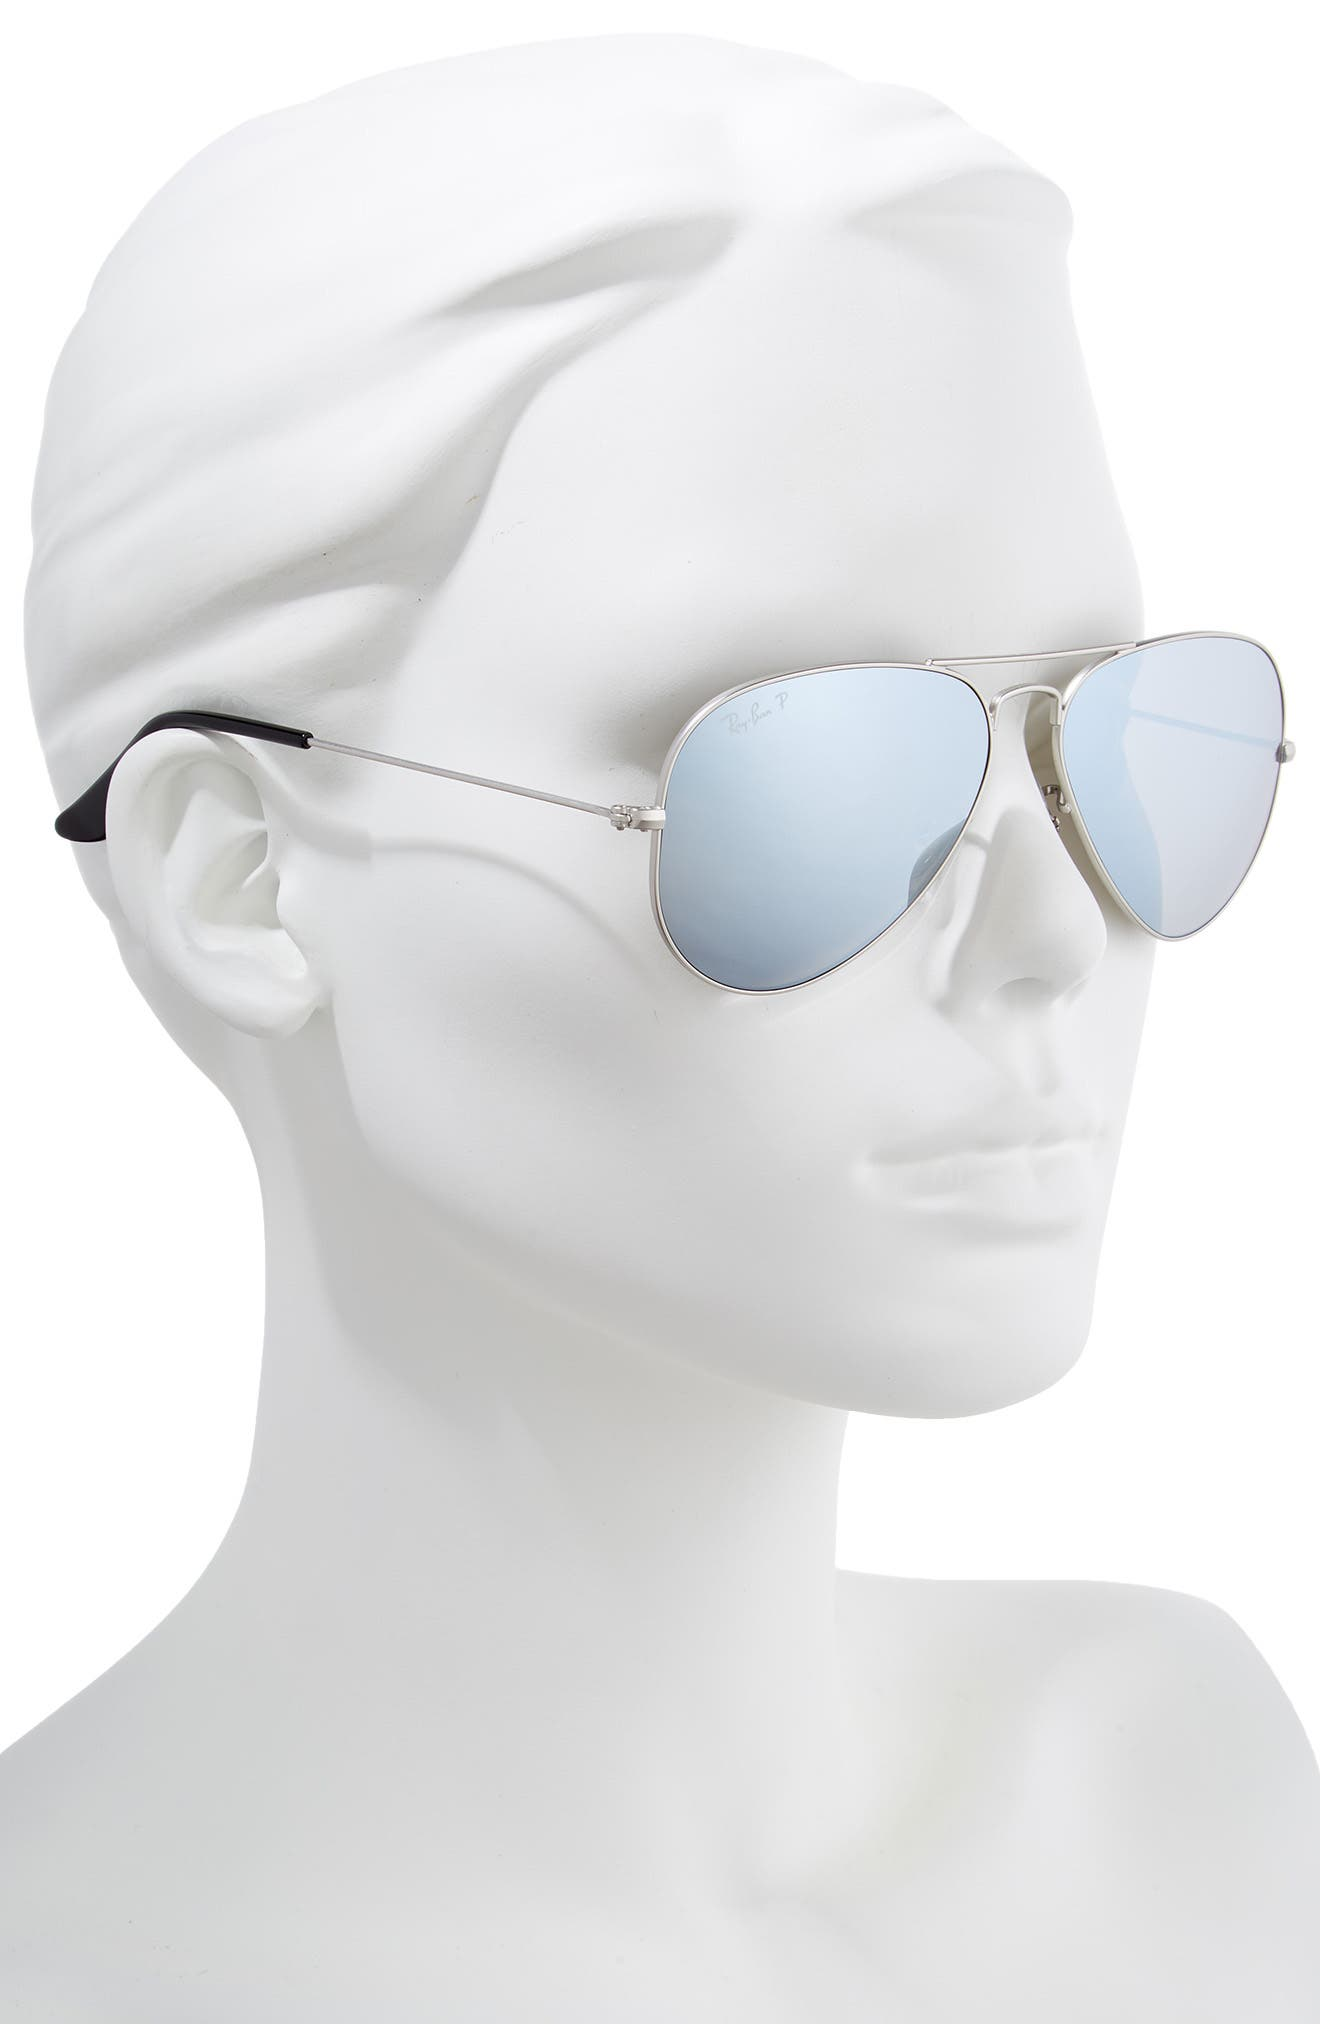 ,                             Standard Icons 58mm Mirrored Polarized Aviator Sunglasses,                             Alternate thumbnail 2, color,                             SILVER/ SILVER MIRROR